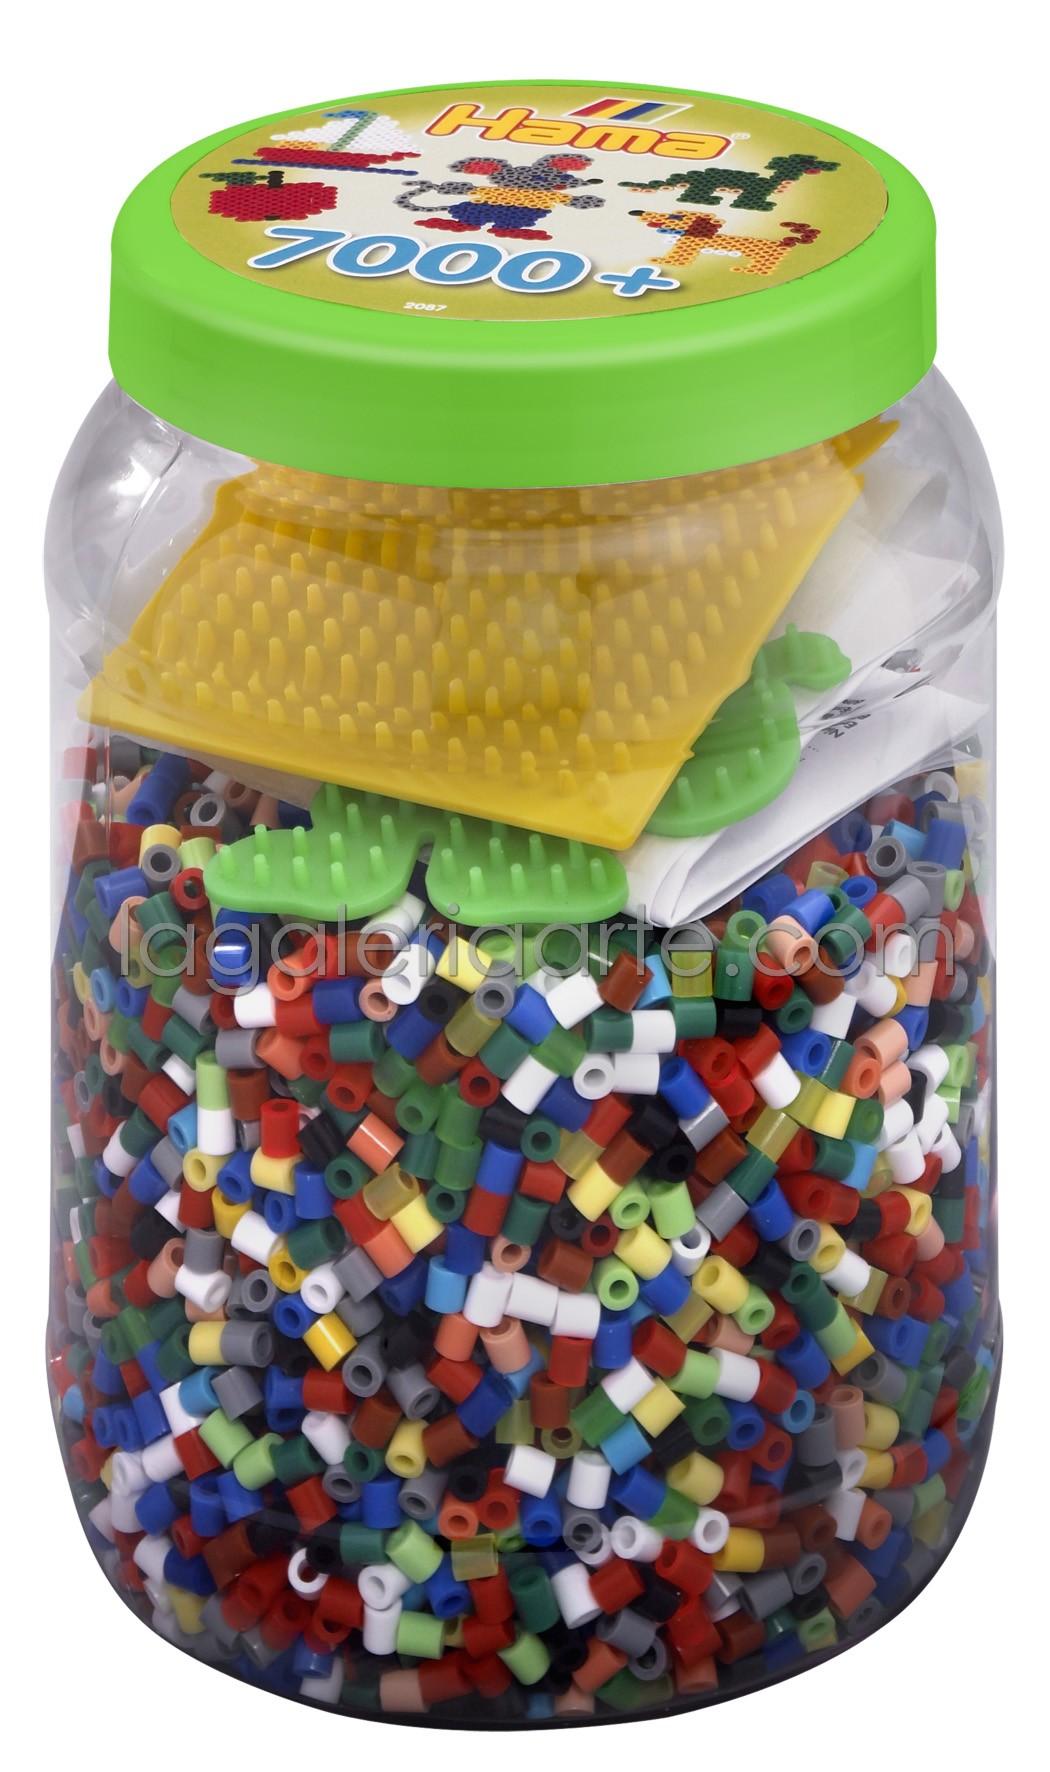 Bote Hama 7.000 Beads y 2 placas/pegboards (nº 2087)